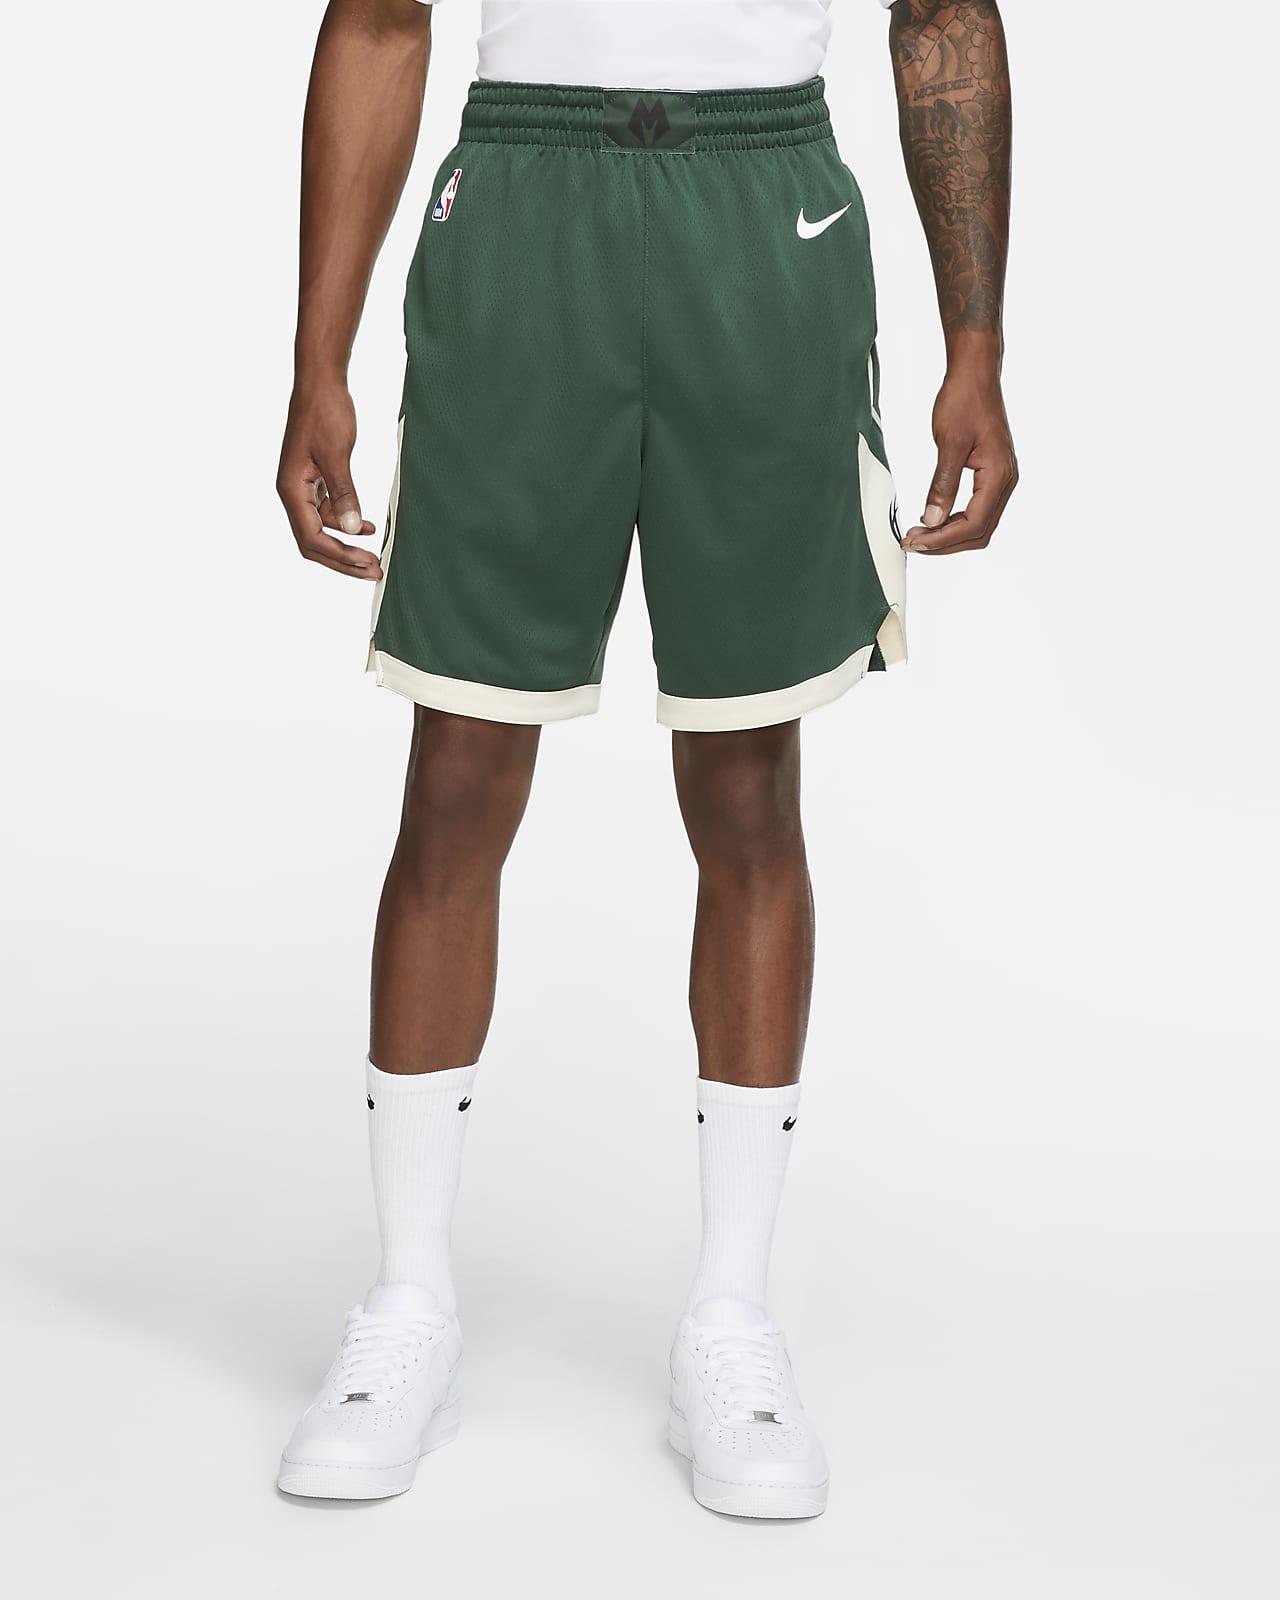 Milwaukee Bucks Icon Edition Men's Nike NBA Swingman Shorts